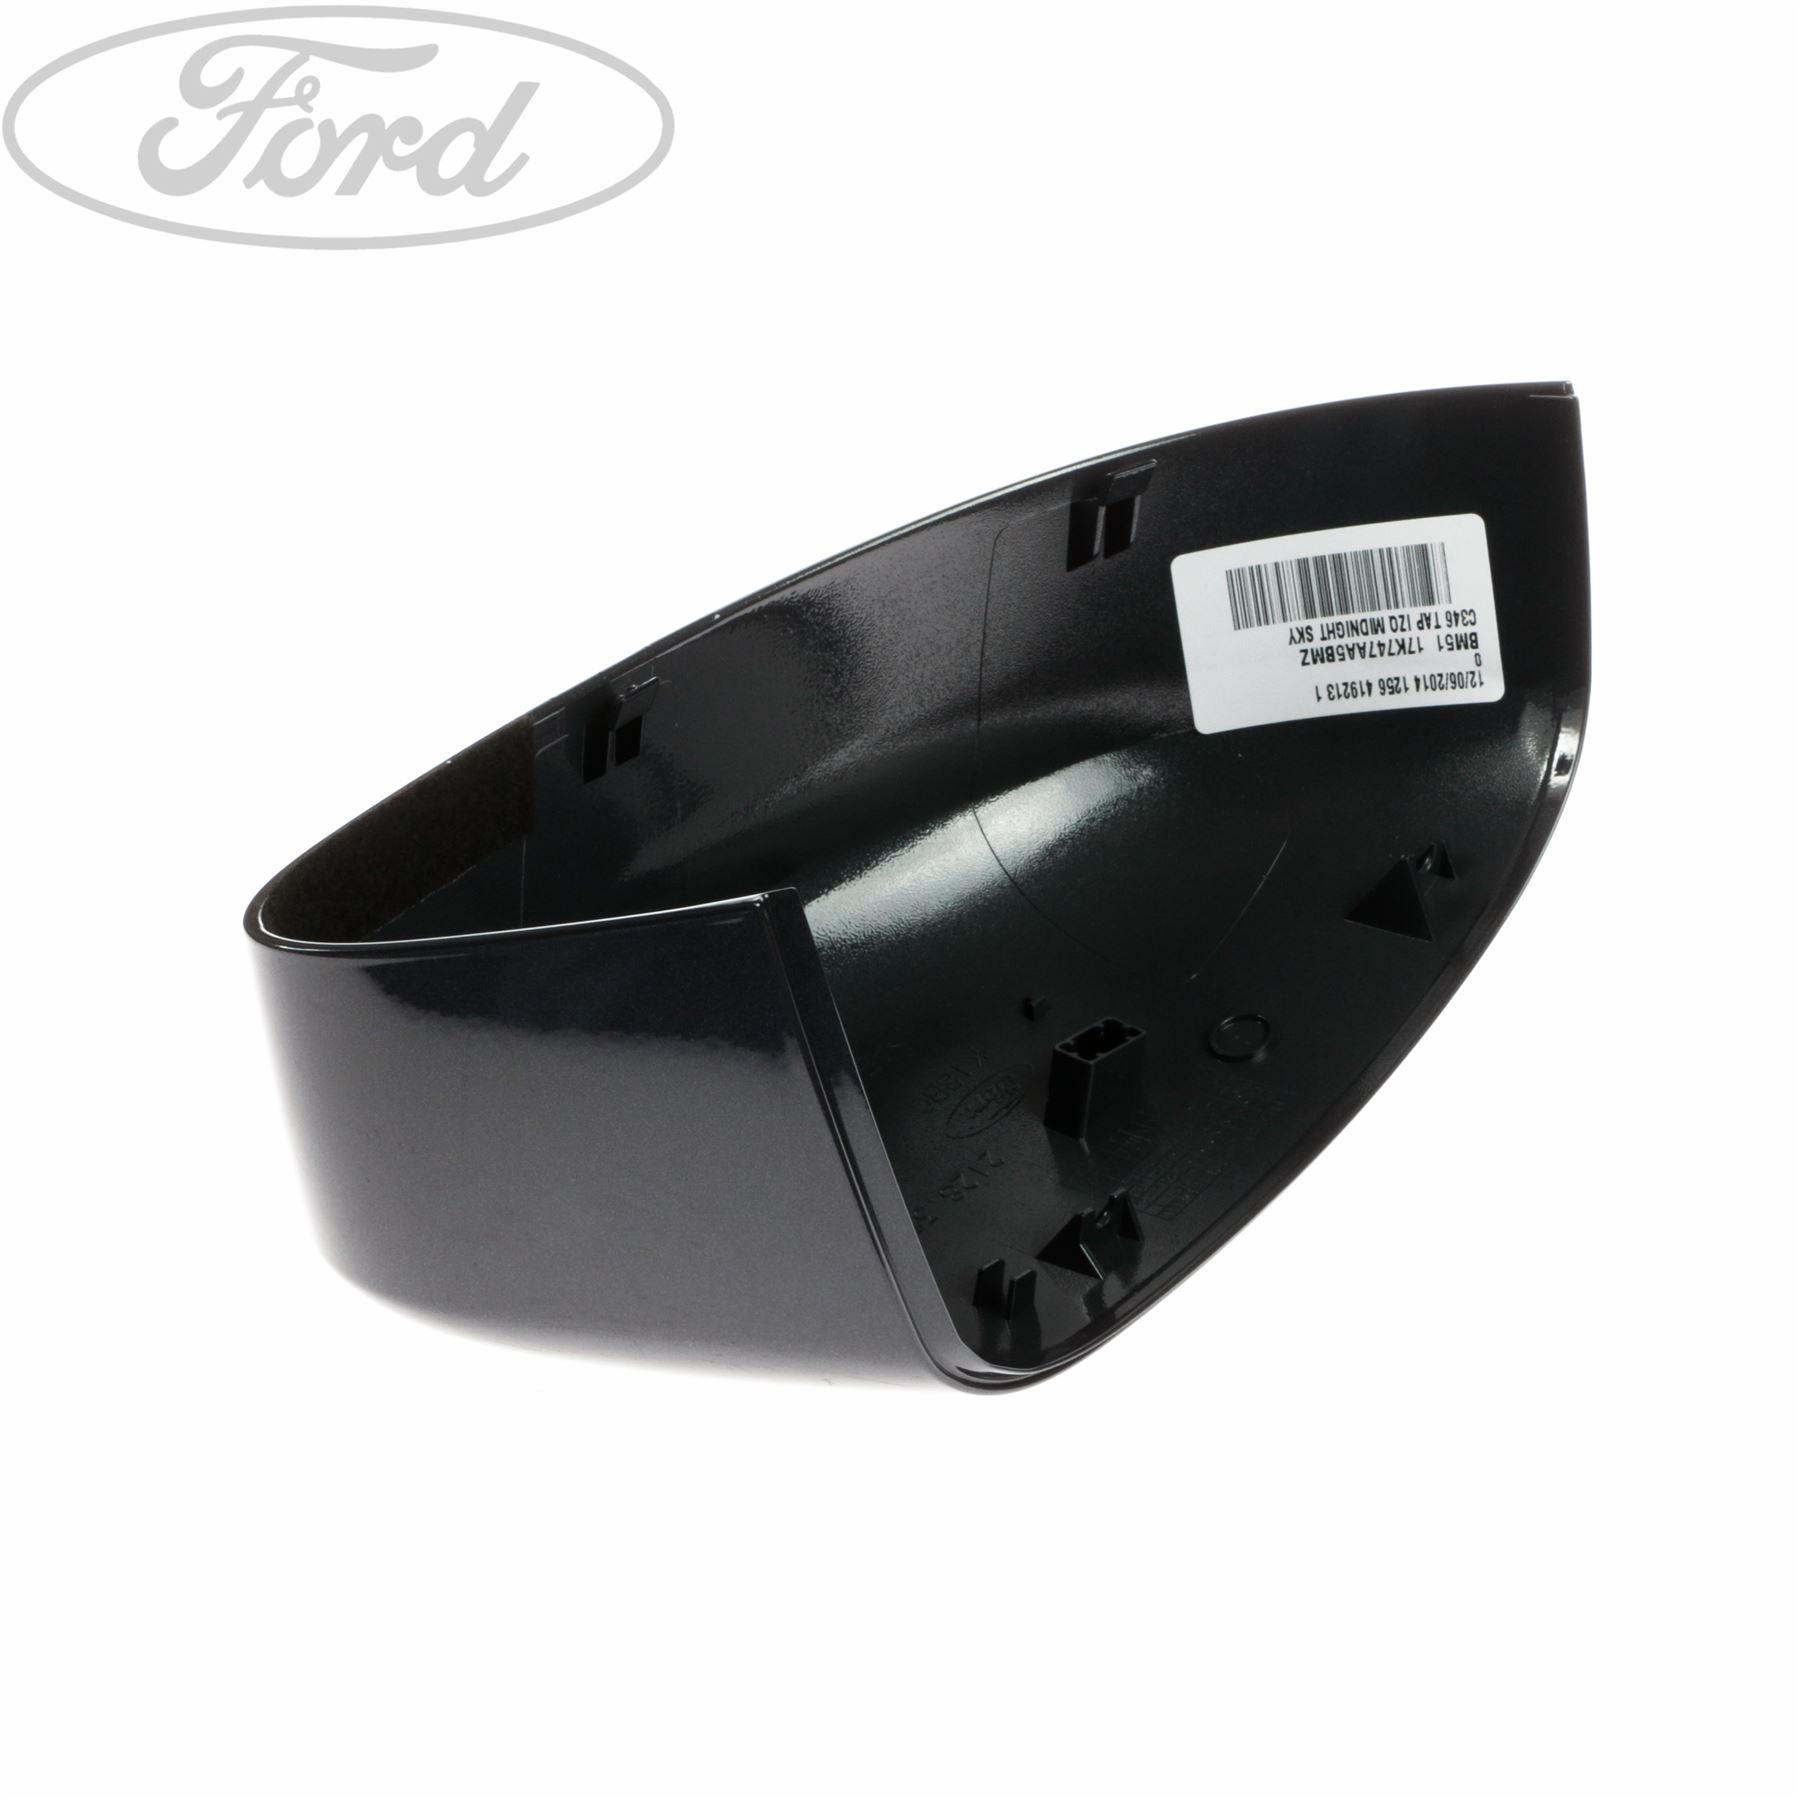 genuine ford focus mk3 front n s left wing mirror housing cap cover rh ebay co uk